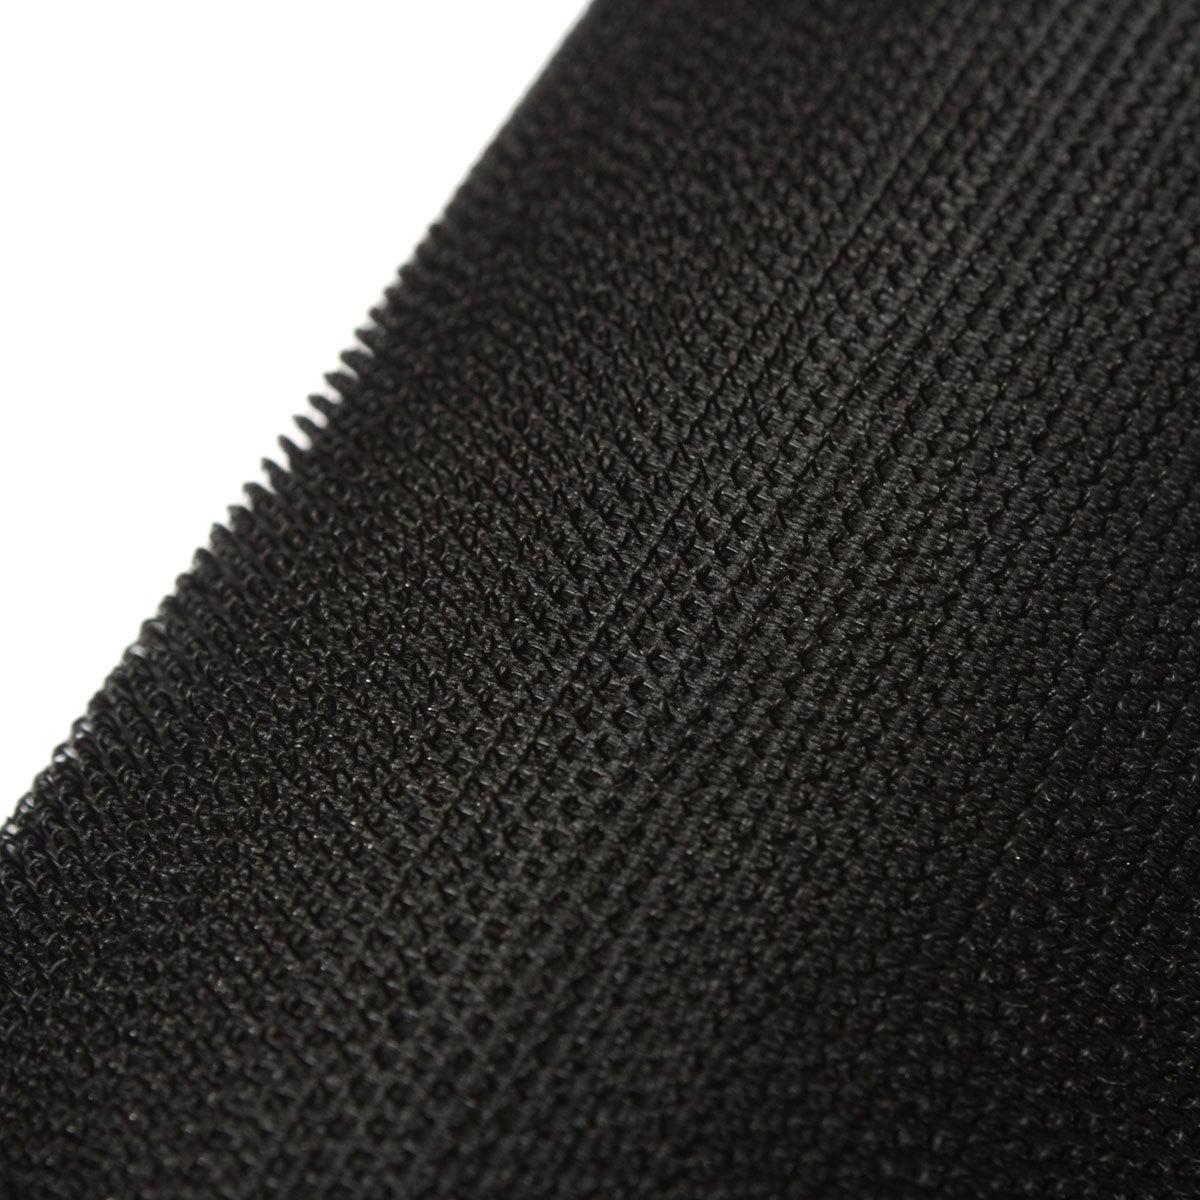 floor cable cover carpet magic tape nylon wire organiser. Black Bedroom Furniture Sets. Home Design Ideas